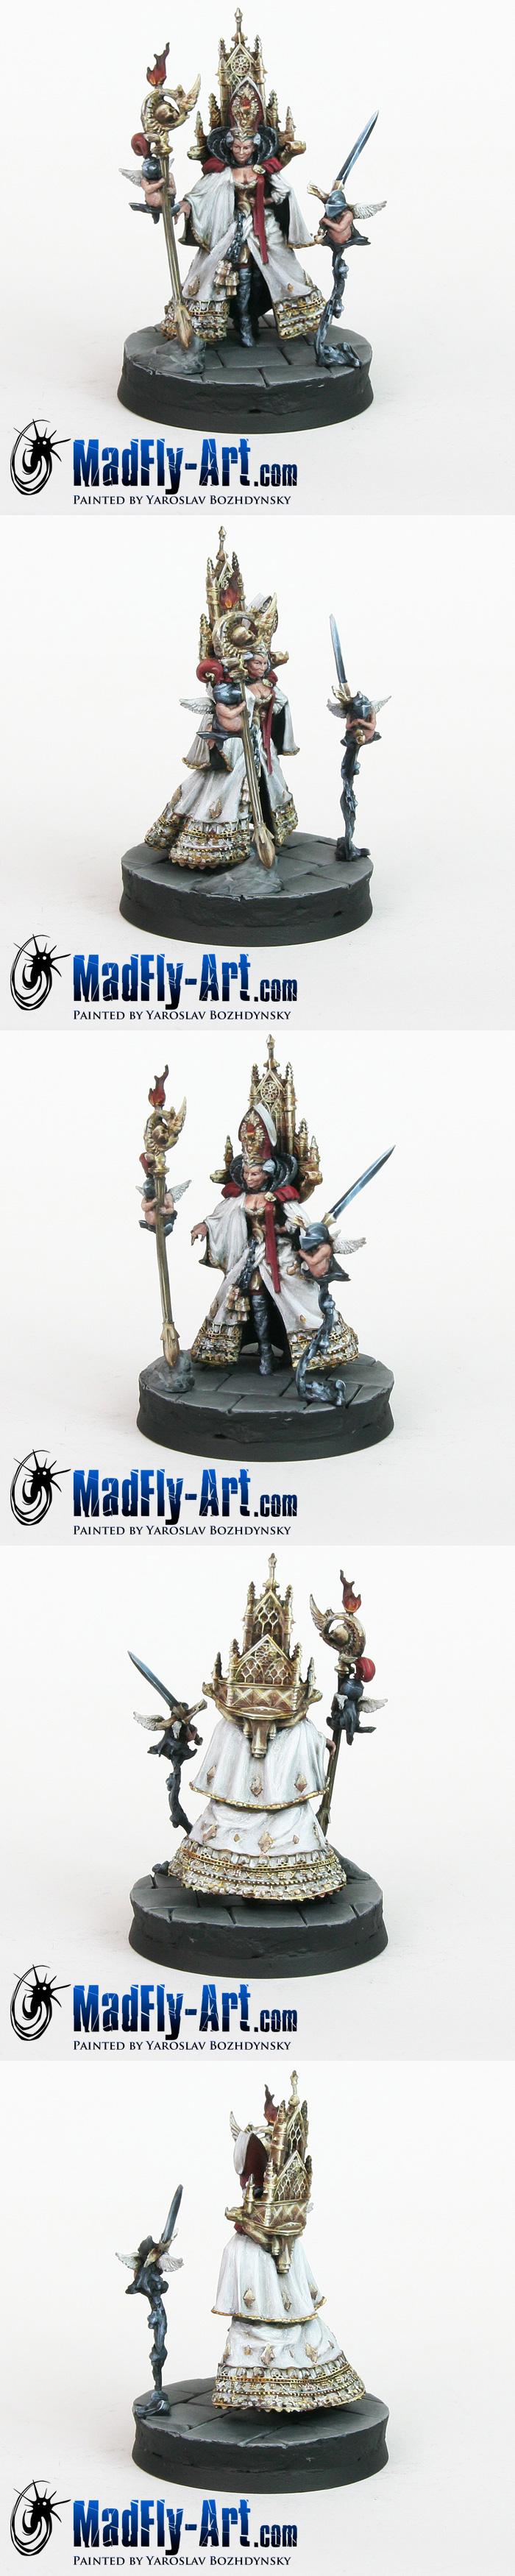 Arthenya VI, The Archpapess